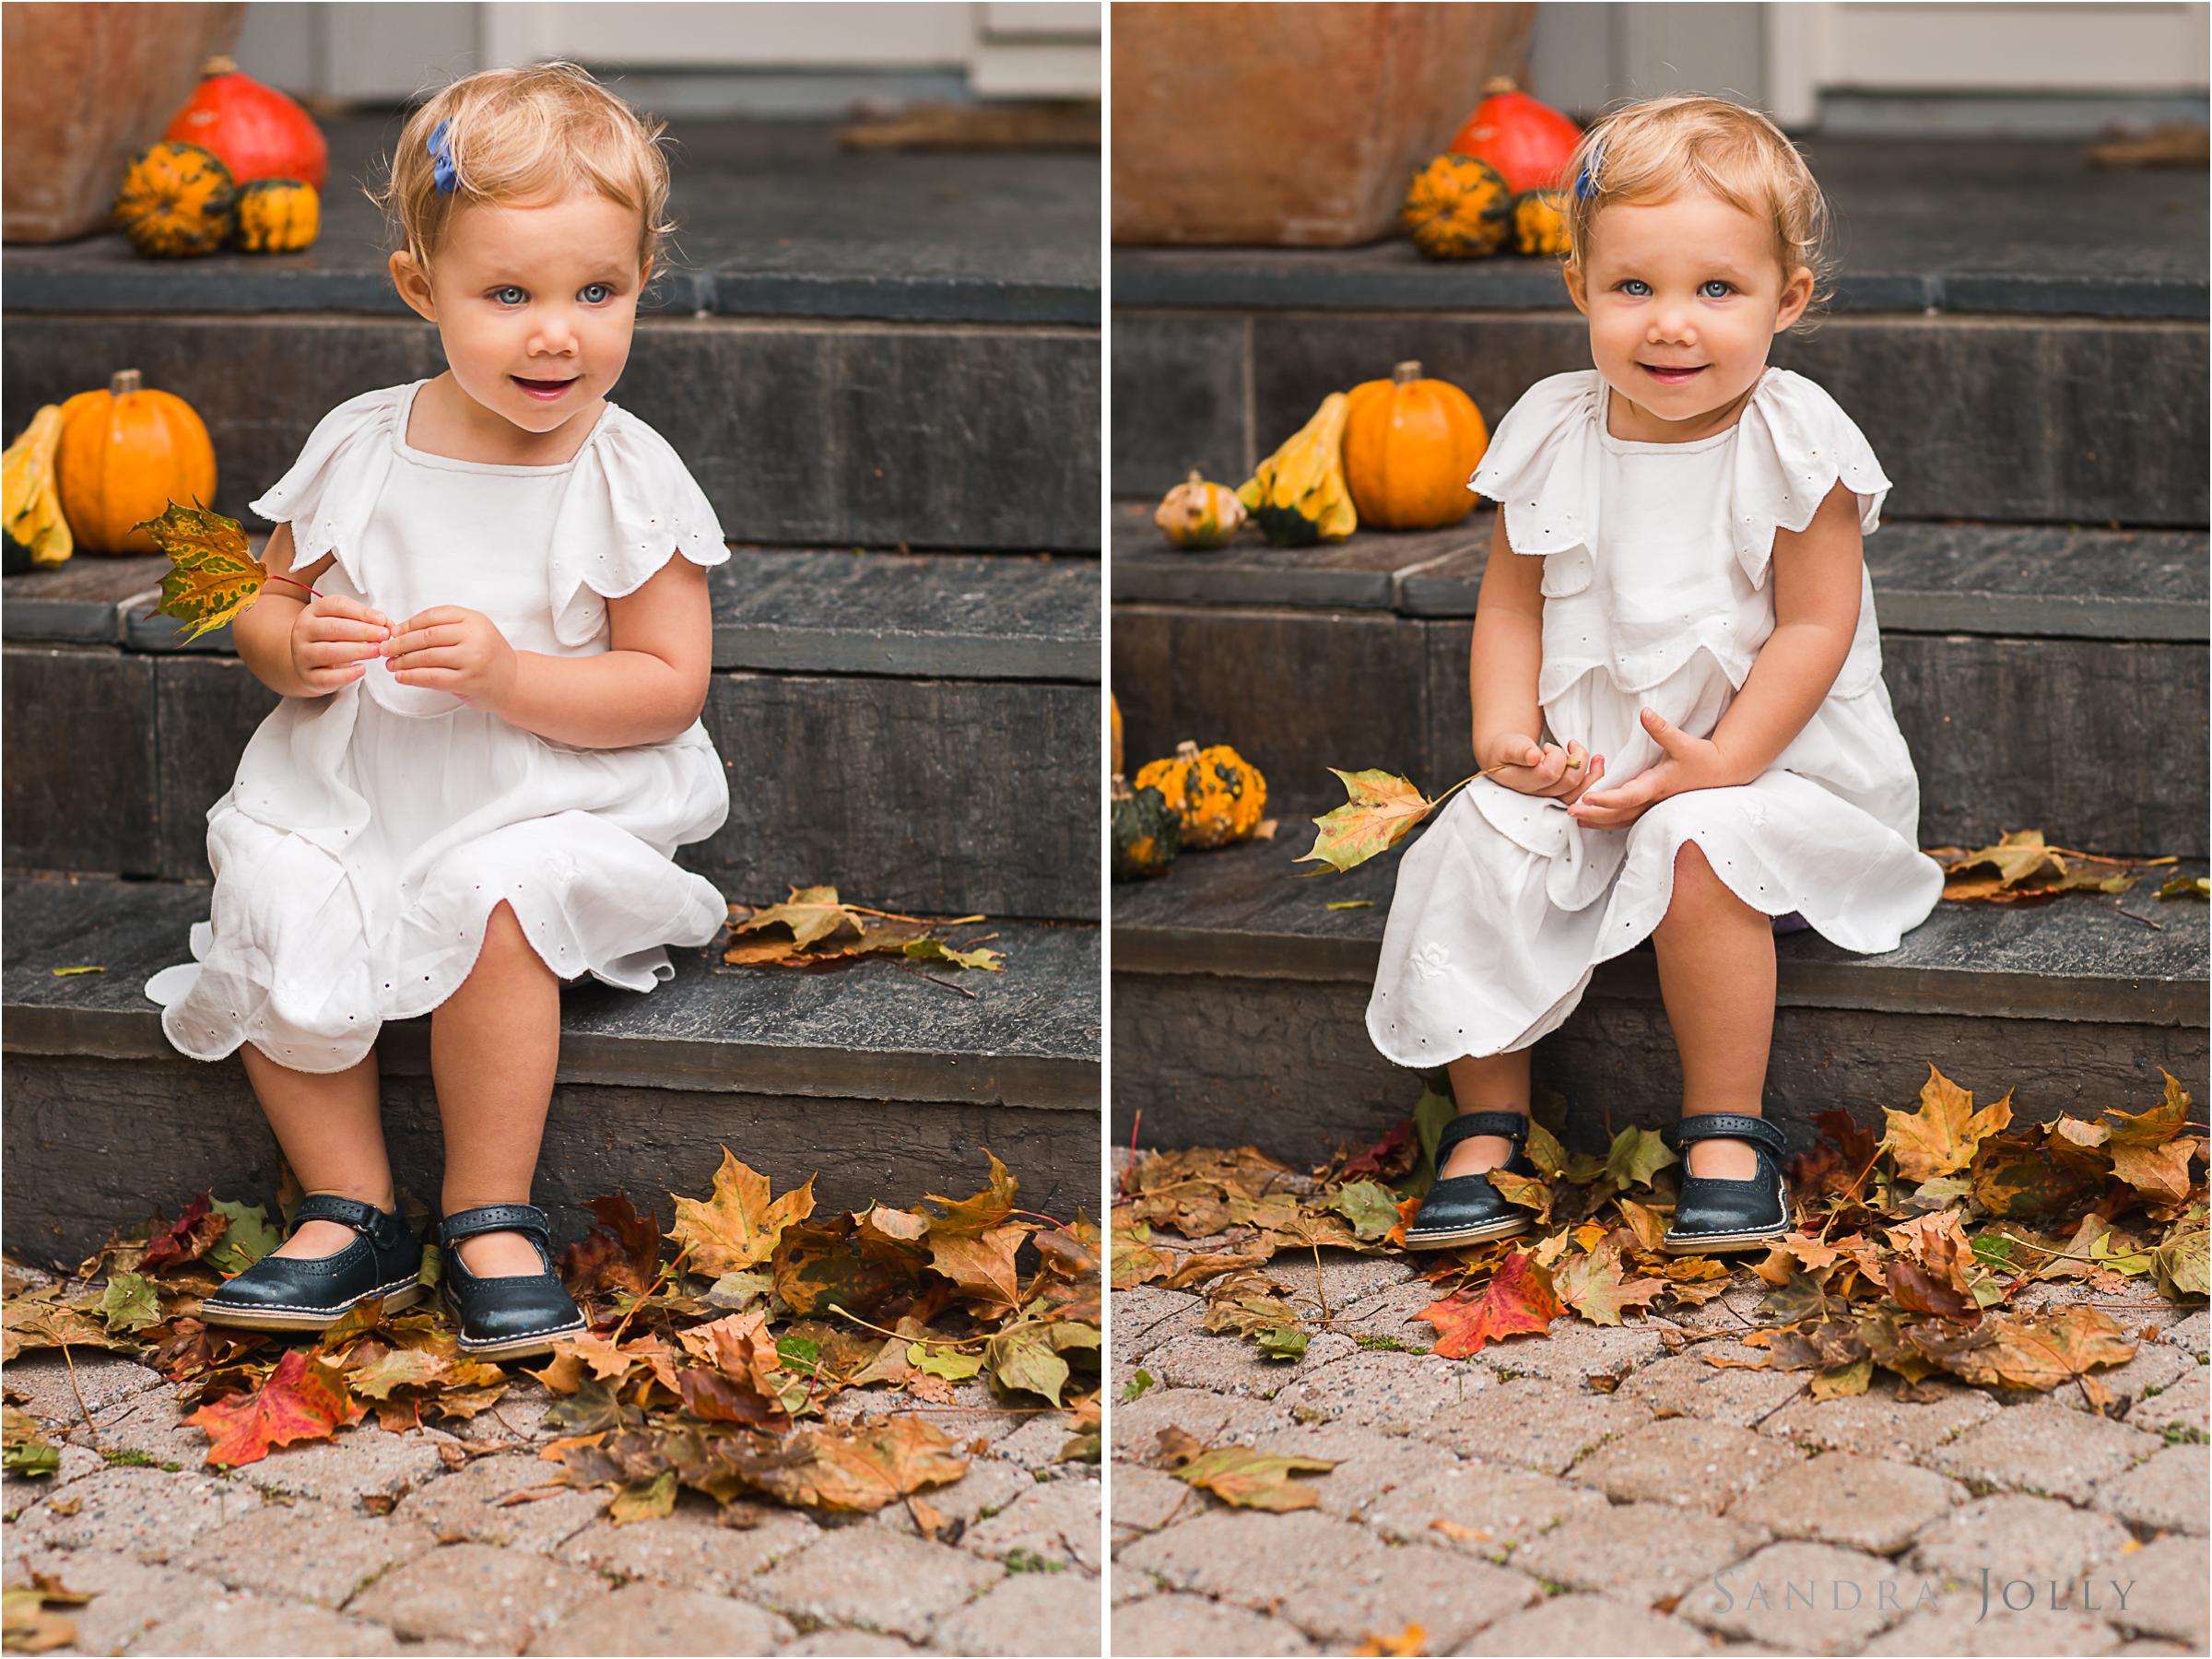 autumn-portrait-of-girl-with-pumpkins-by-child-photographer-sandra-jolly.jpg